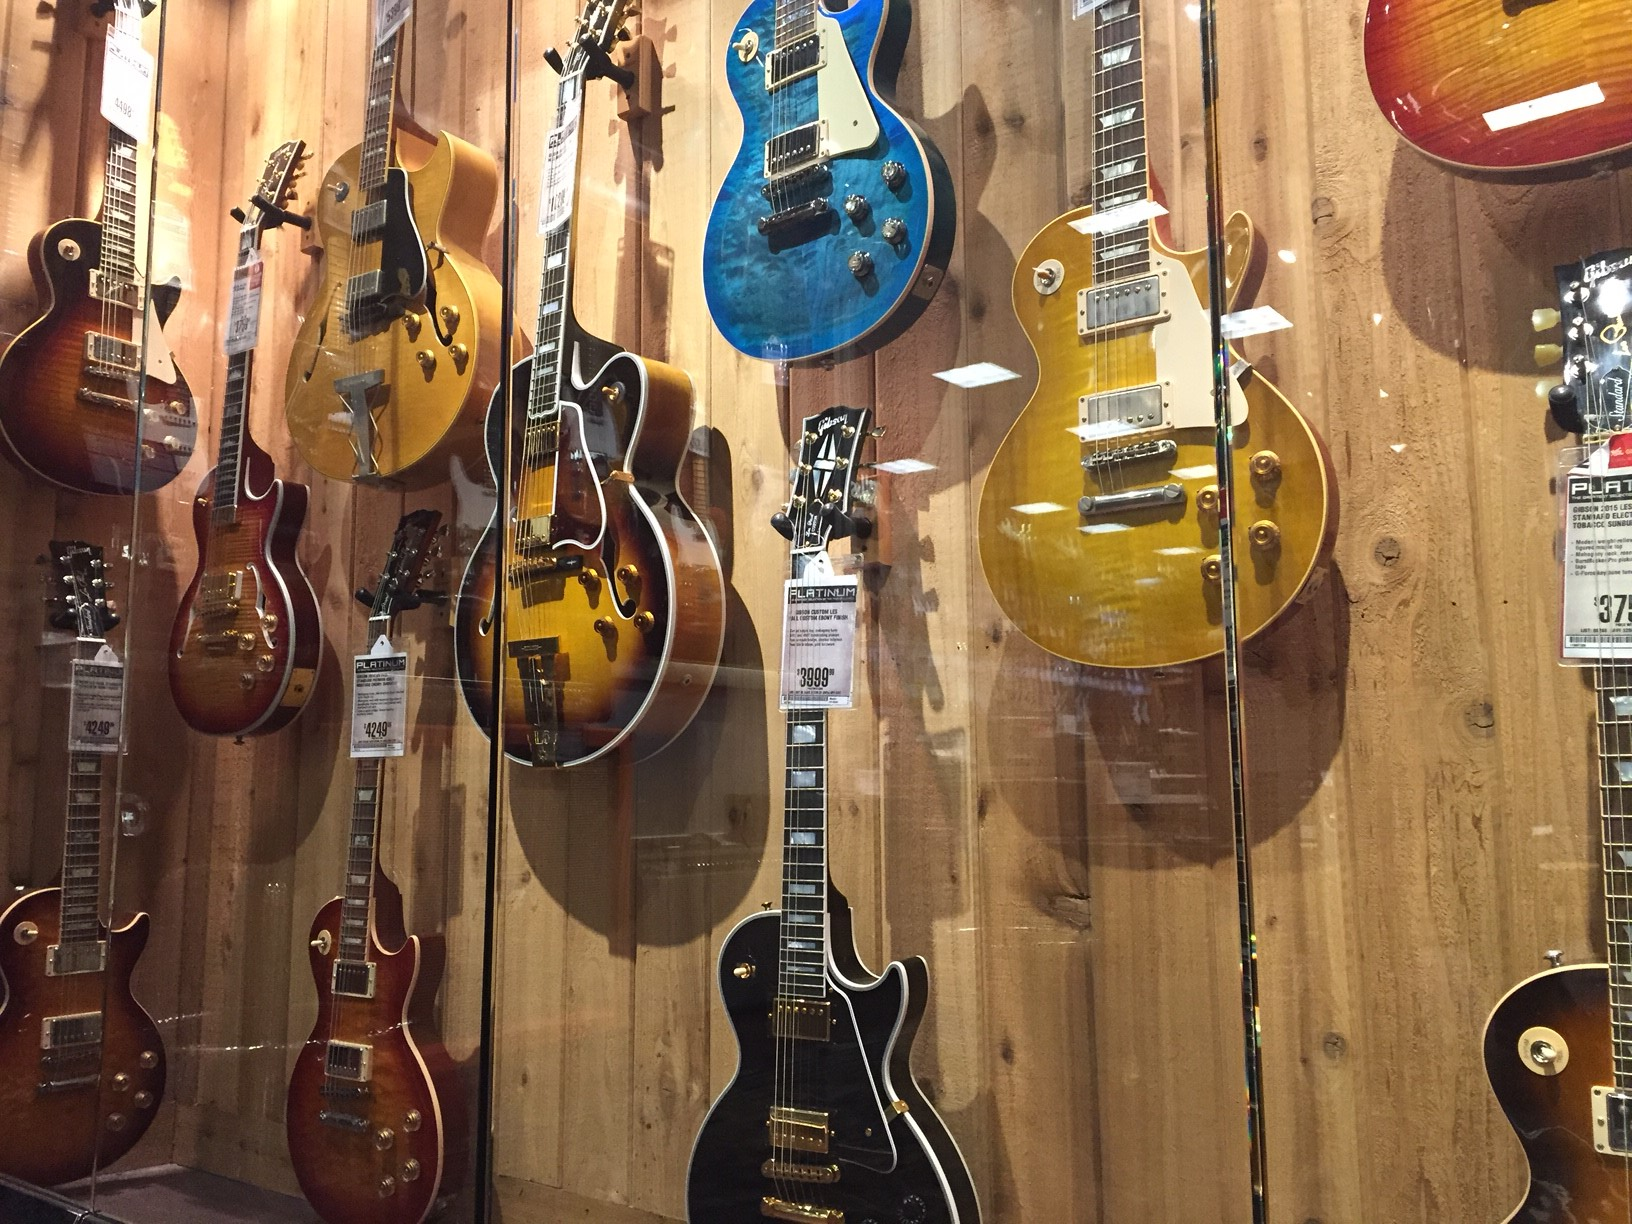 guitar center 3677 stevens creek boulevard santa clara, ca music